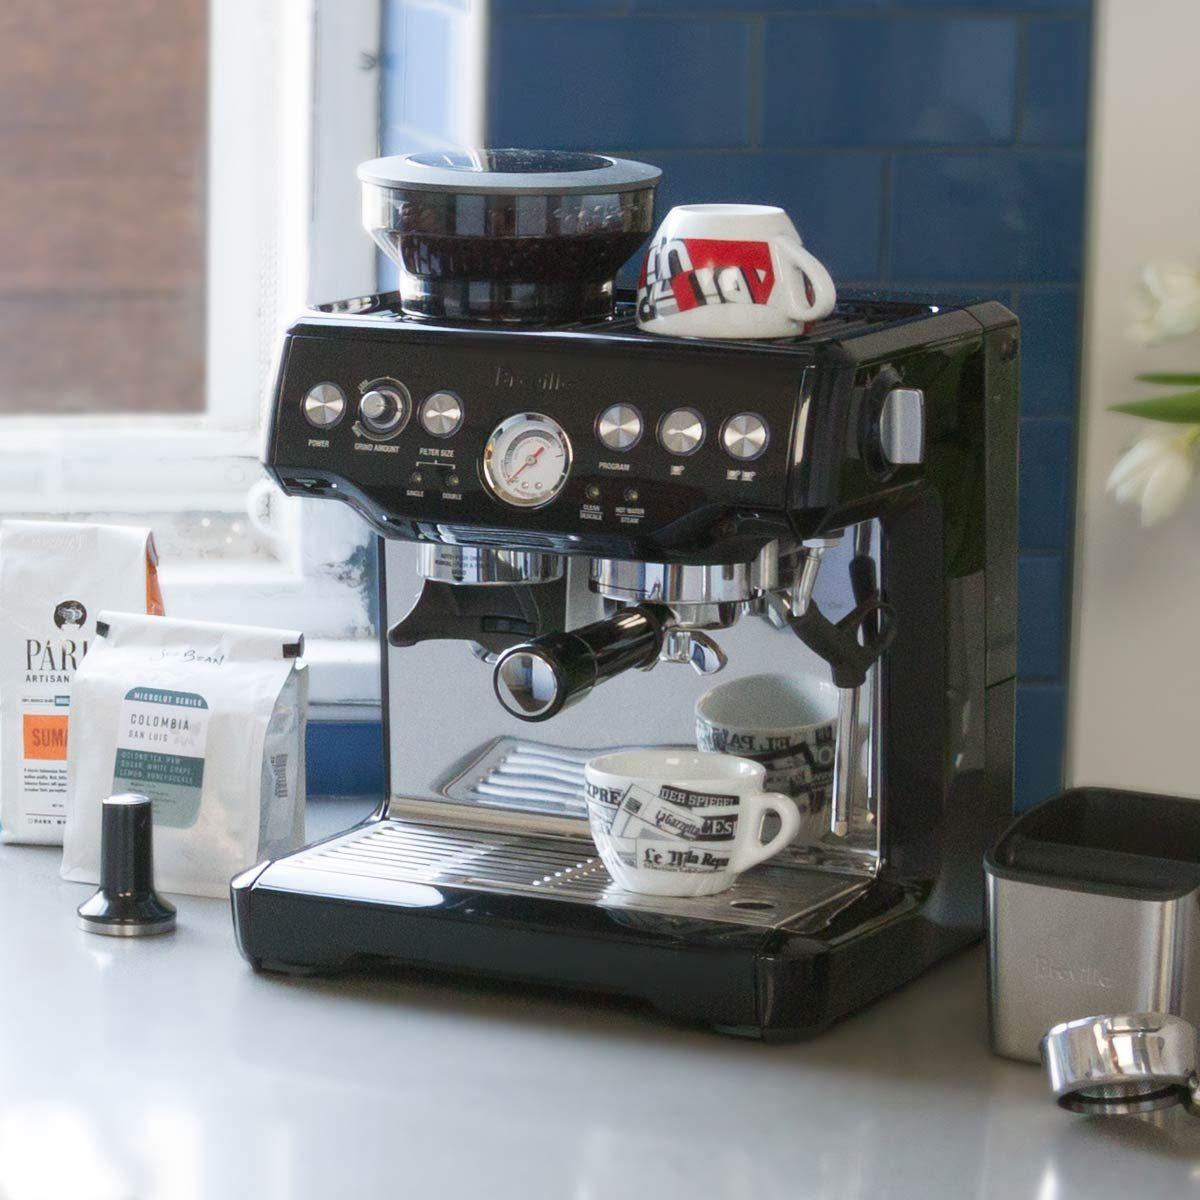 Breville Bes920xl Dual Boiler Espresso Machine In Black Espresso Machine Espresso Breville Barista Express